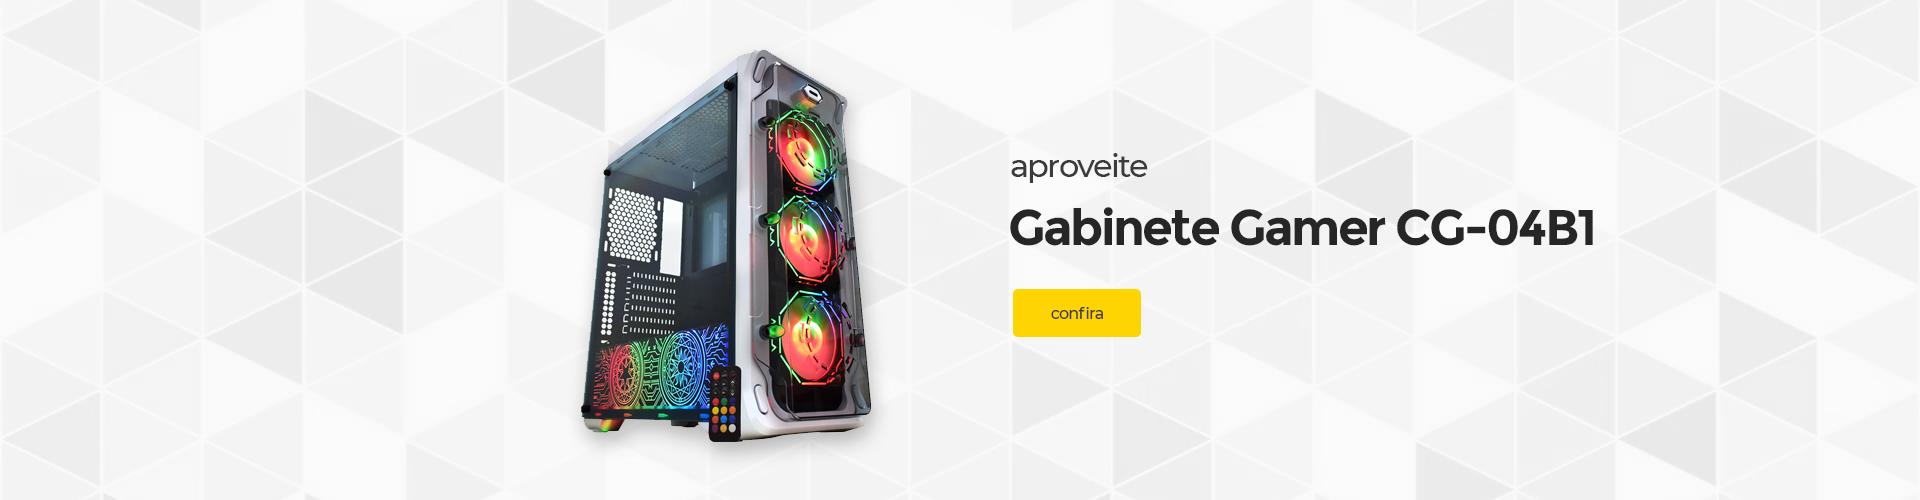 Gabinete Gamer CG-04B1